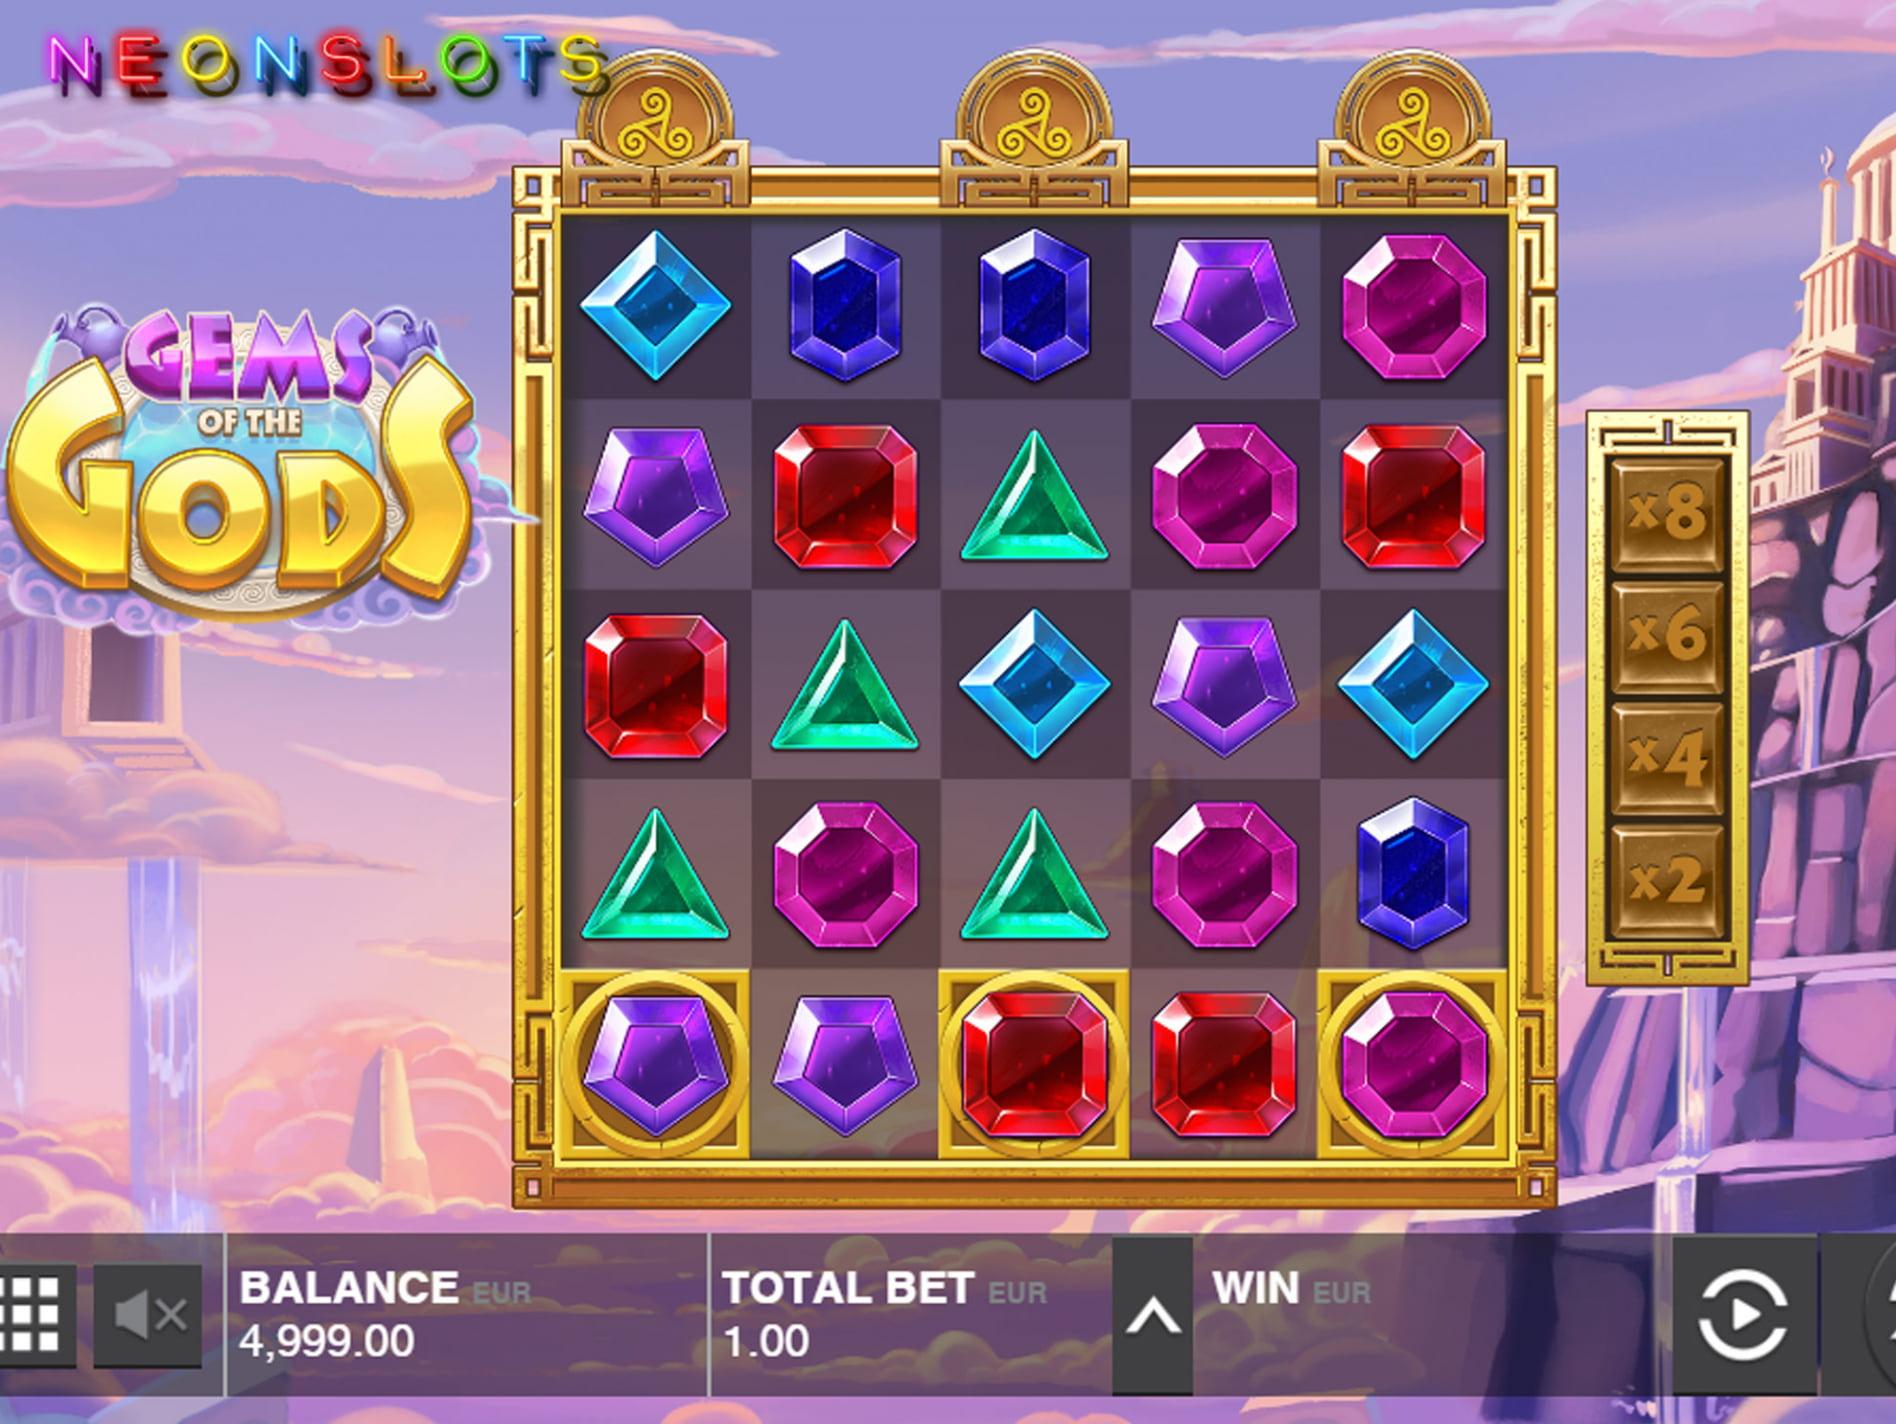 Asia Gaming slots tragamonedas avatar jugar gratis-39537